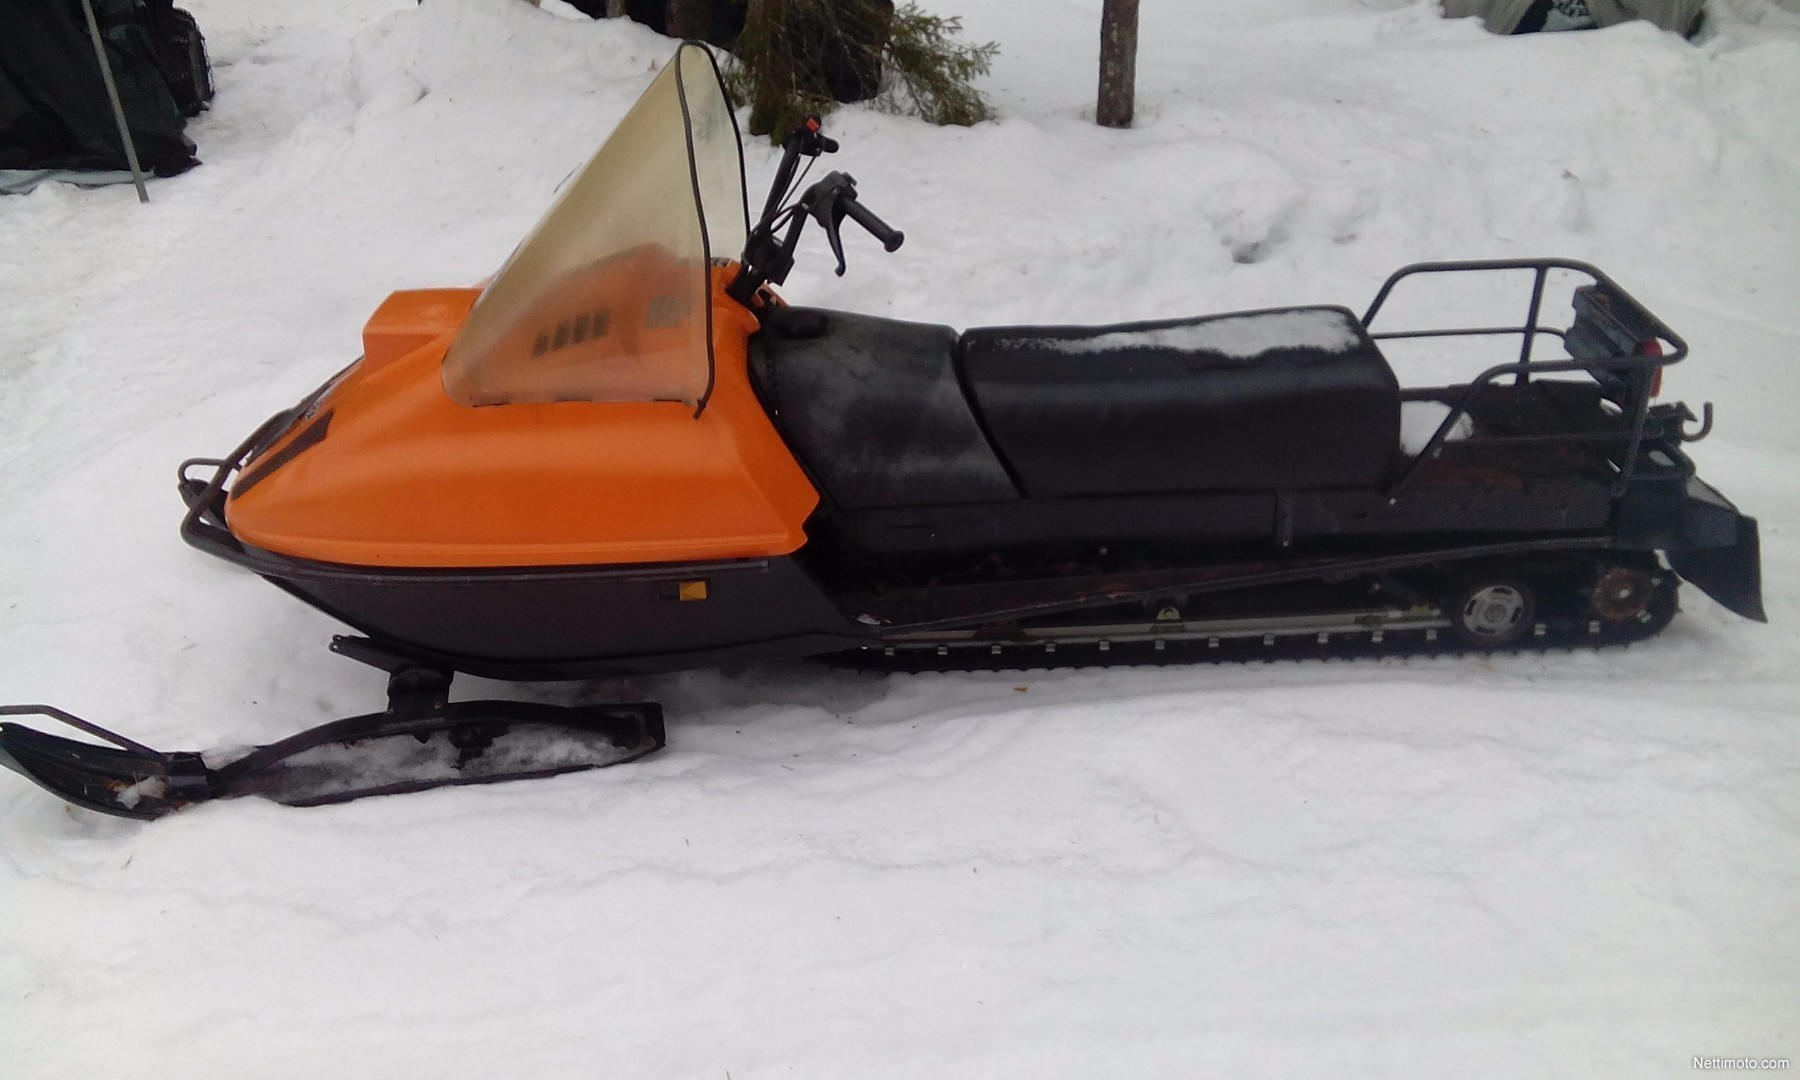 Ski Doo Tundra >> Ski-Doo Tundra 250 250 cm³ 1985 - Ranua - Moottorikelkka - Nettimoto